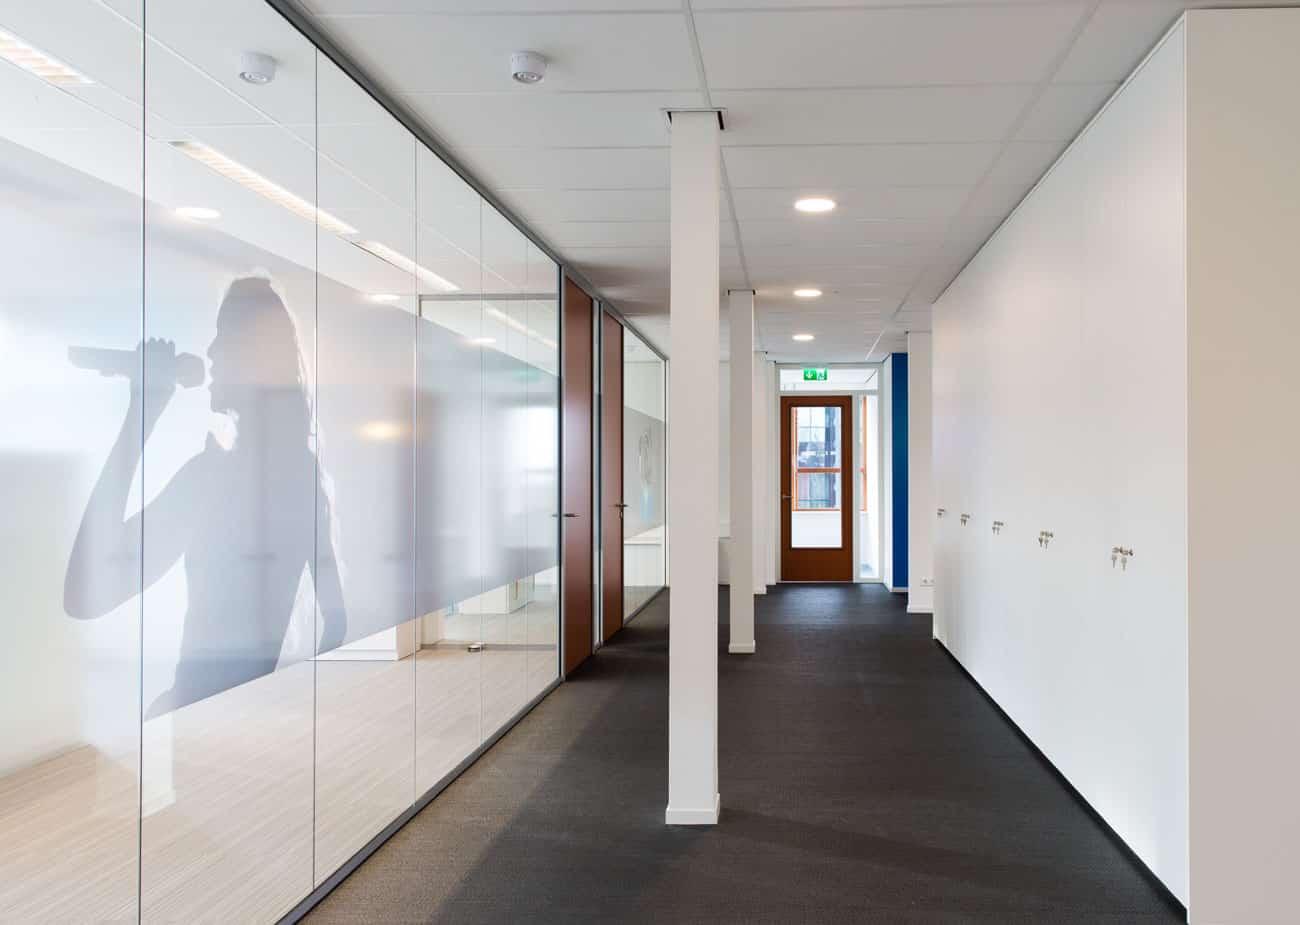 Sennheiser, Almere | Plan Effect